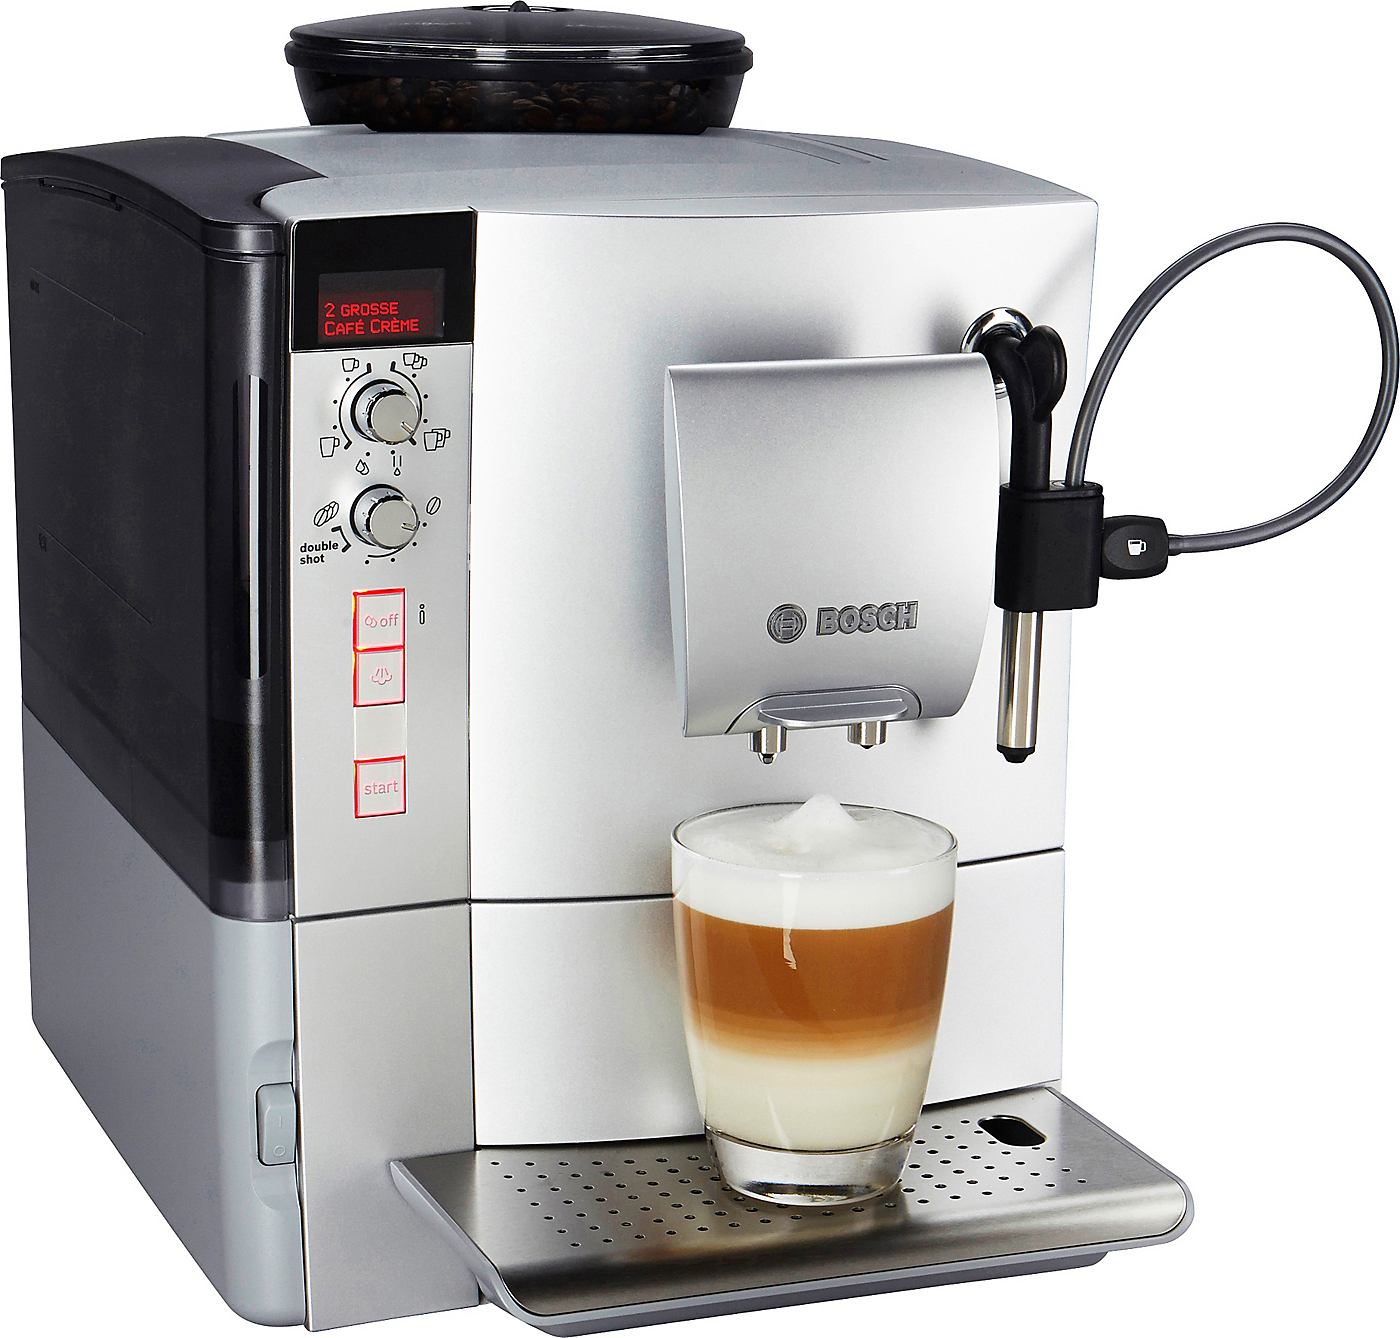 bosch tes50351de kaffeevollautomat. Black Bedroom Furniture Sets. Home Design Ideas